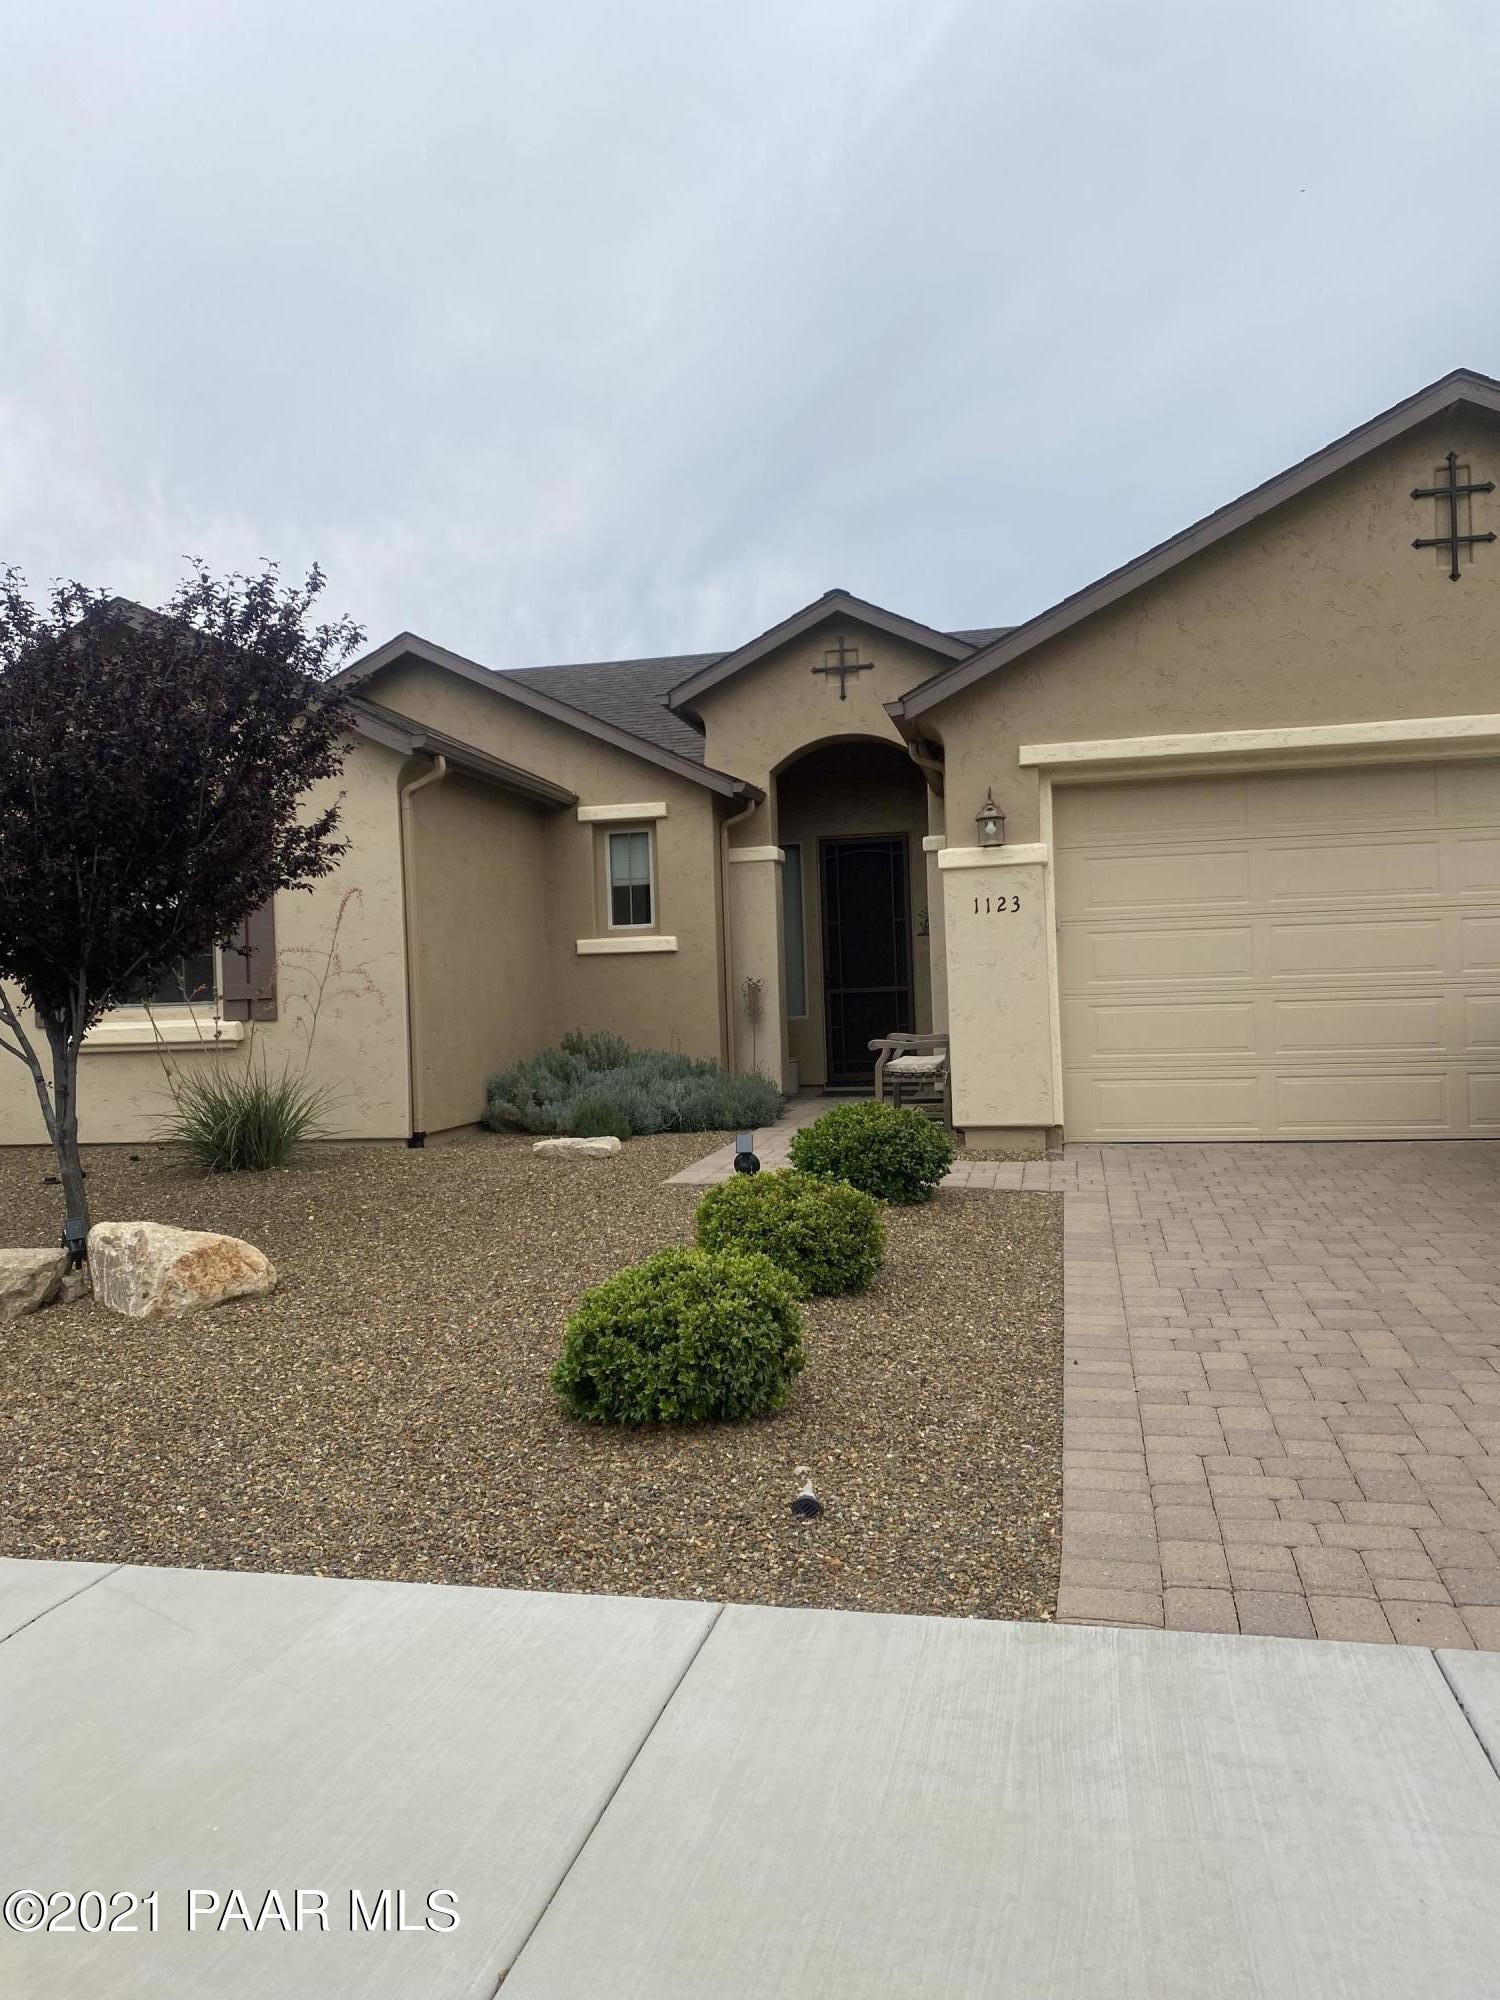 Photo of 1123 Lucky Draw, Prescott Valley, AZ 86314